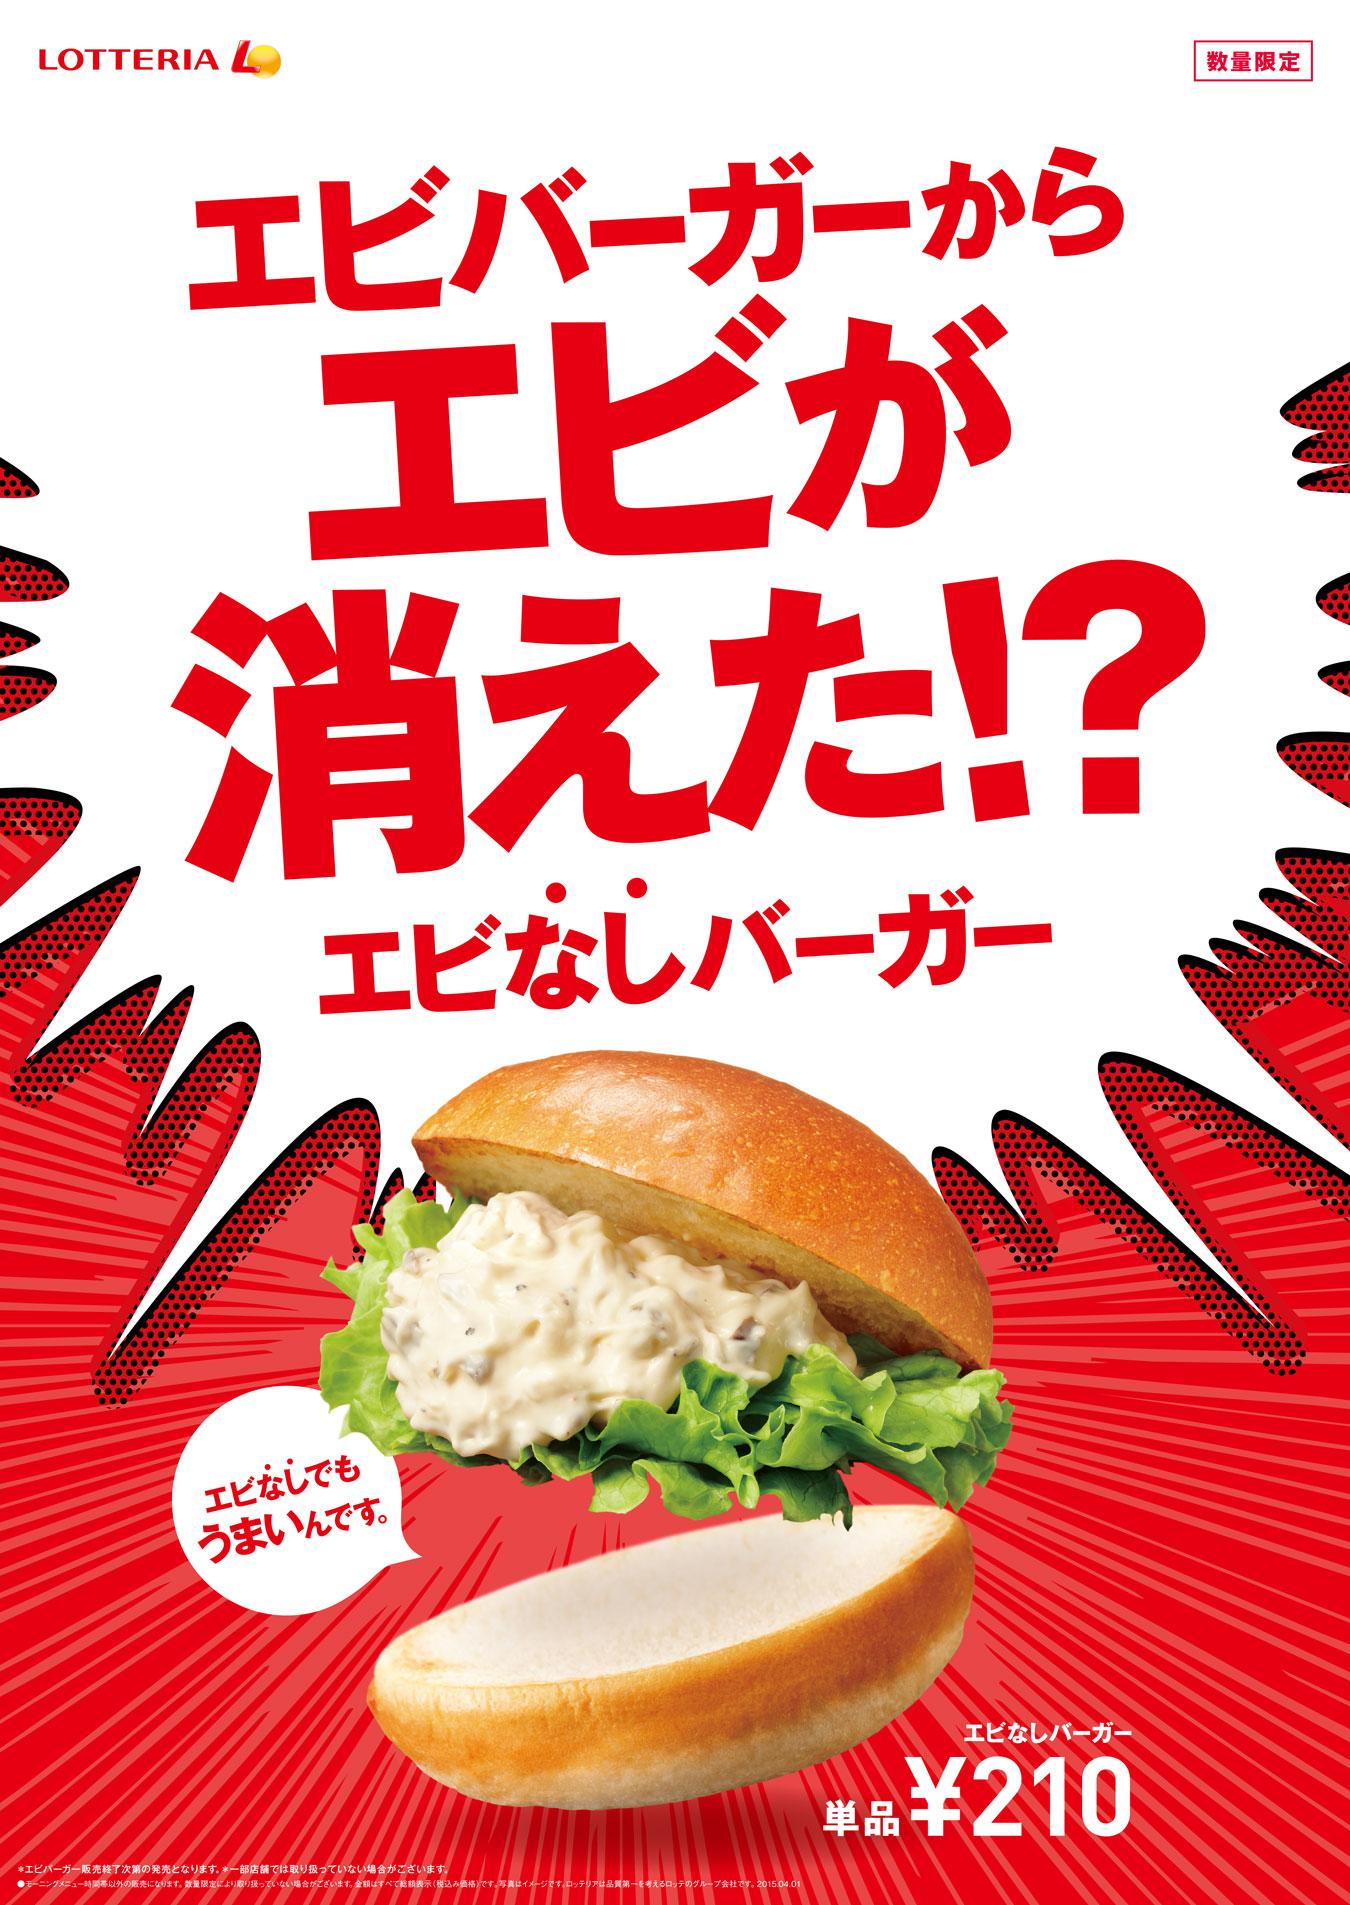 Lotteria Japan's patty-free burger